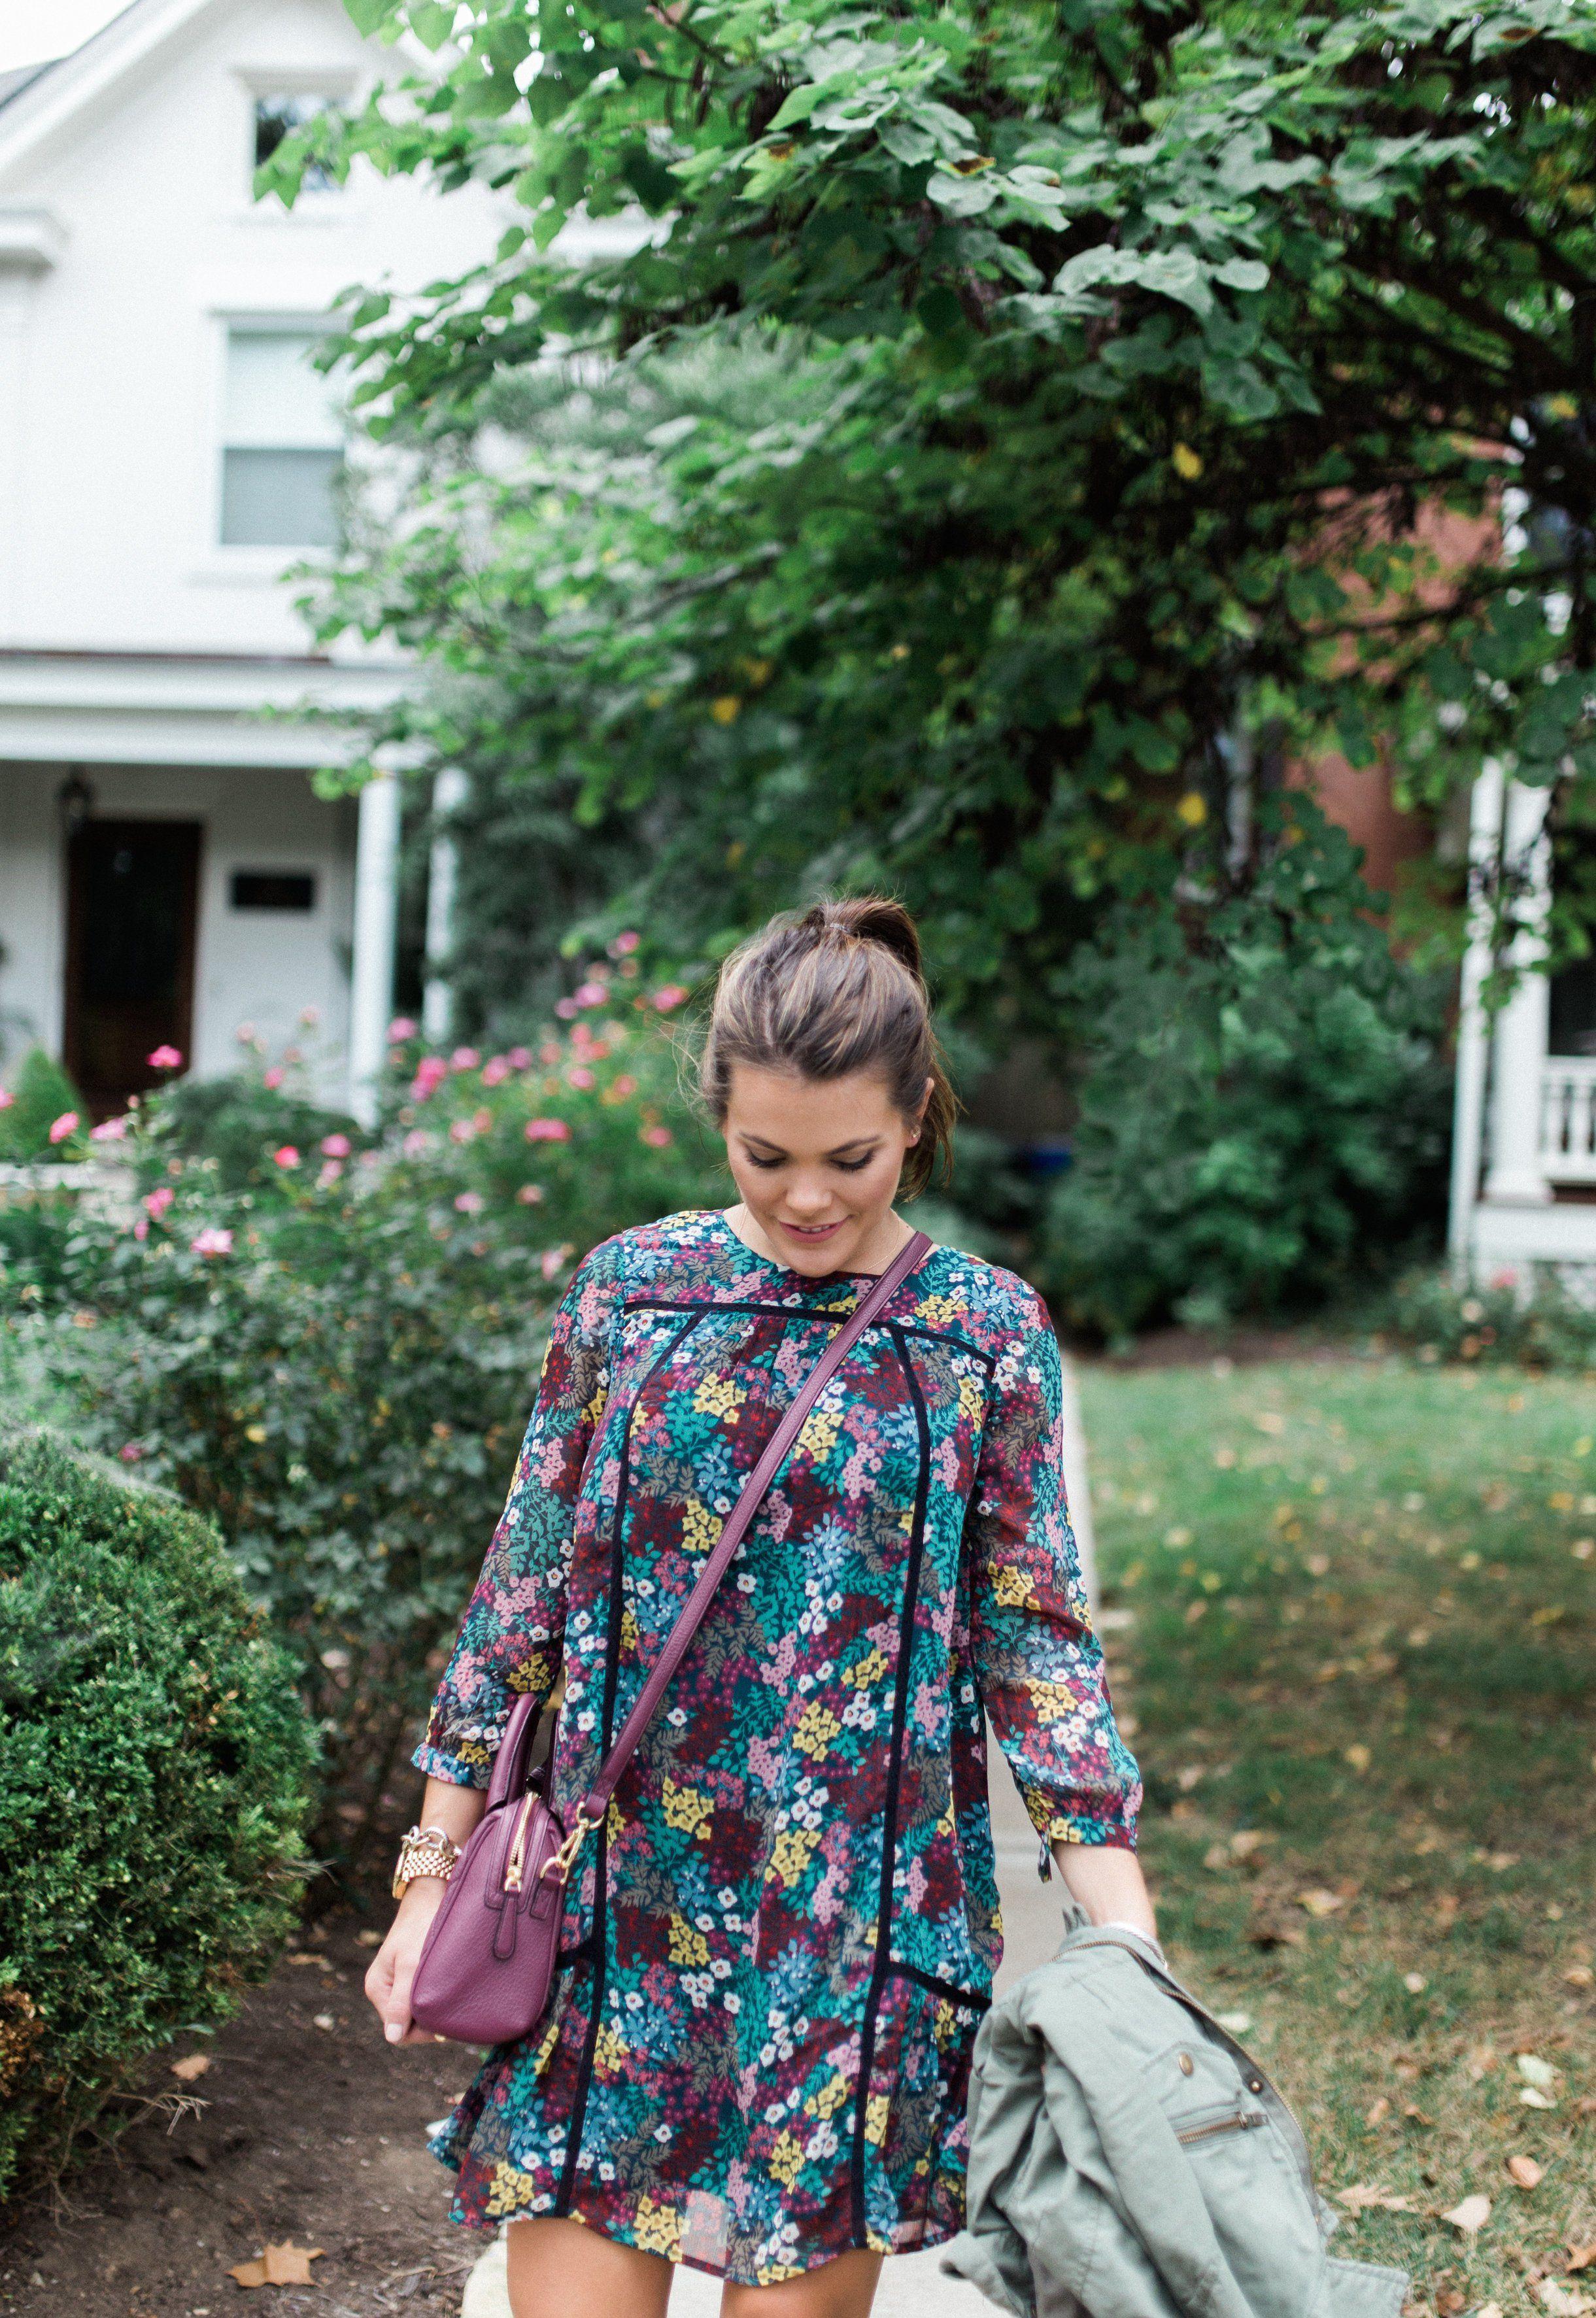 Fall Fashion via Glitter & Gingham // LOFT Floral Dress, Vera Bradley Leather Bag, Peep Toe Booties, Utility Jacket